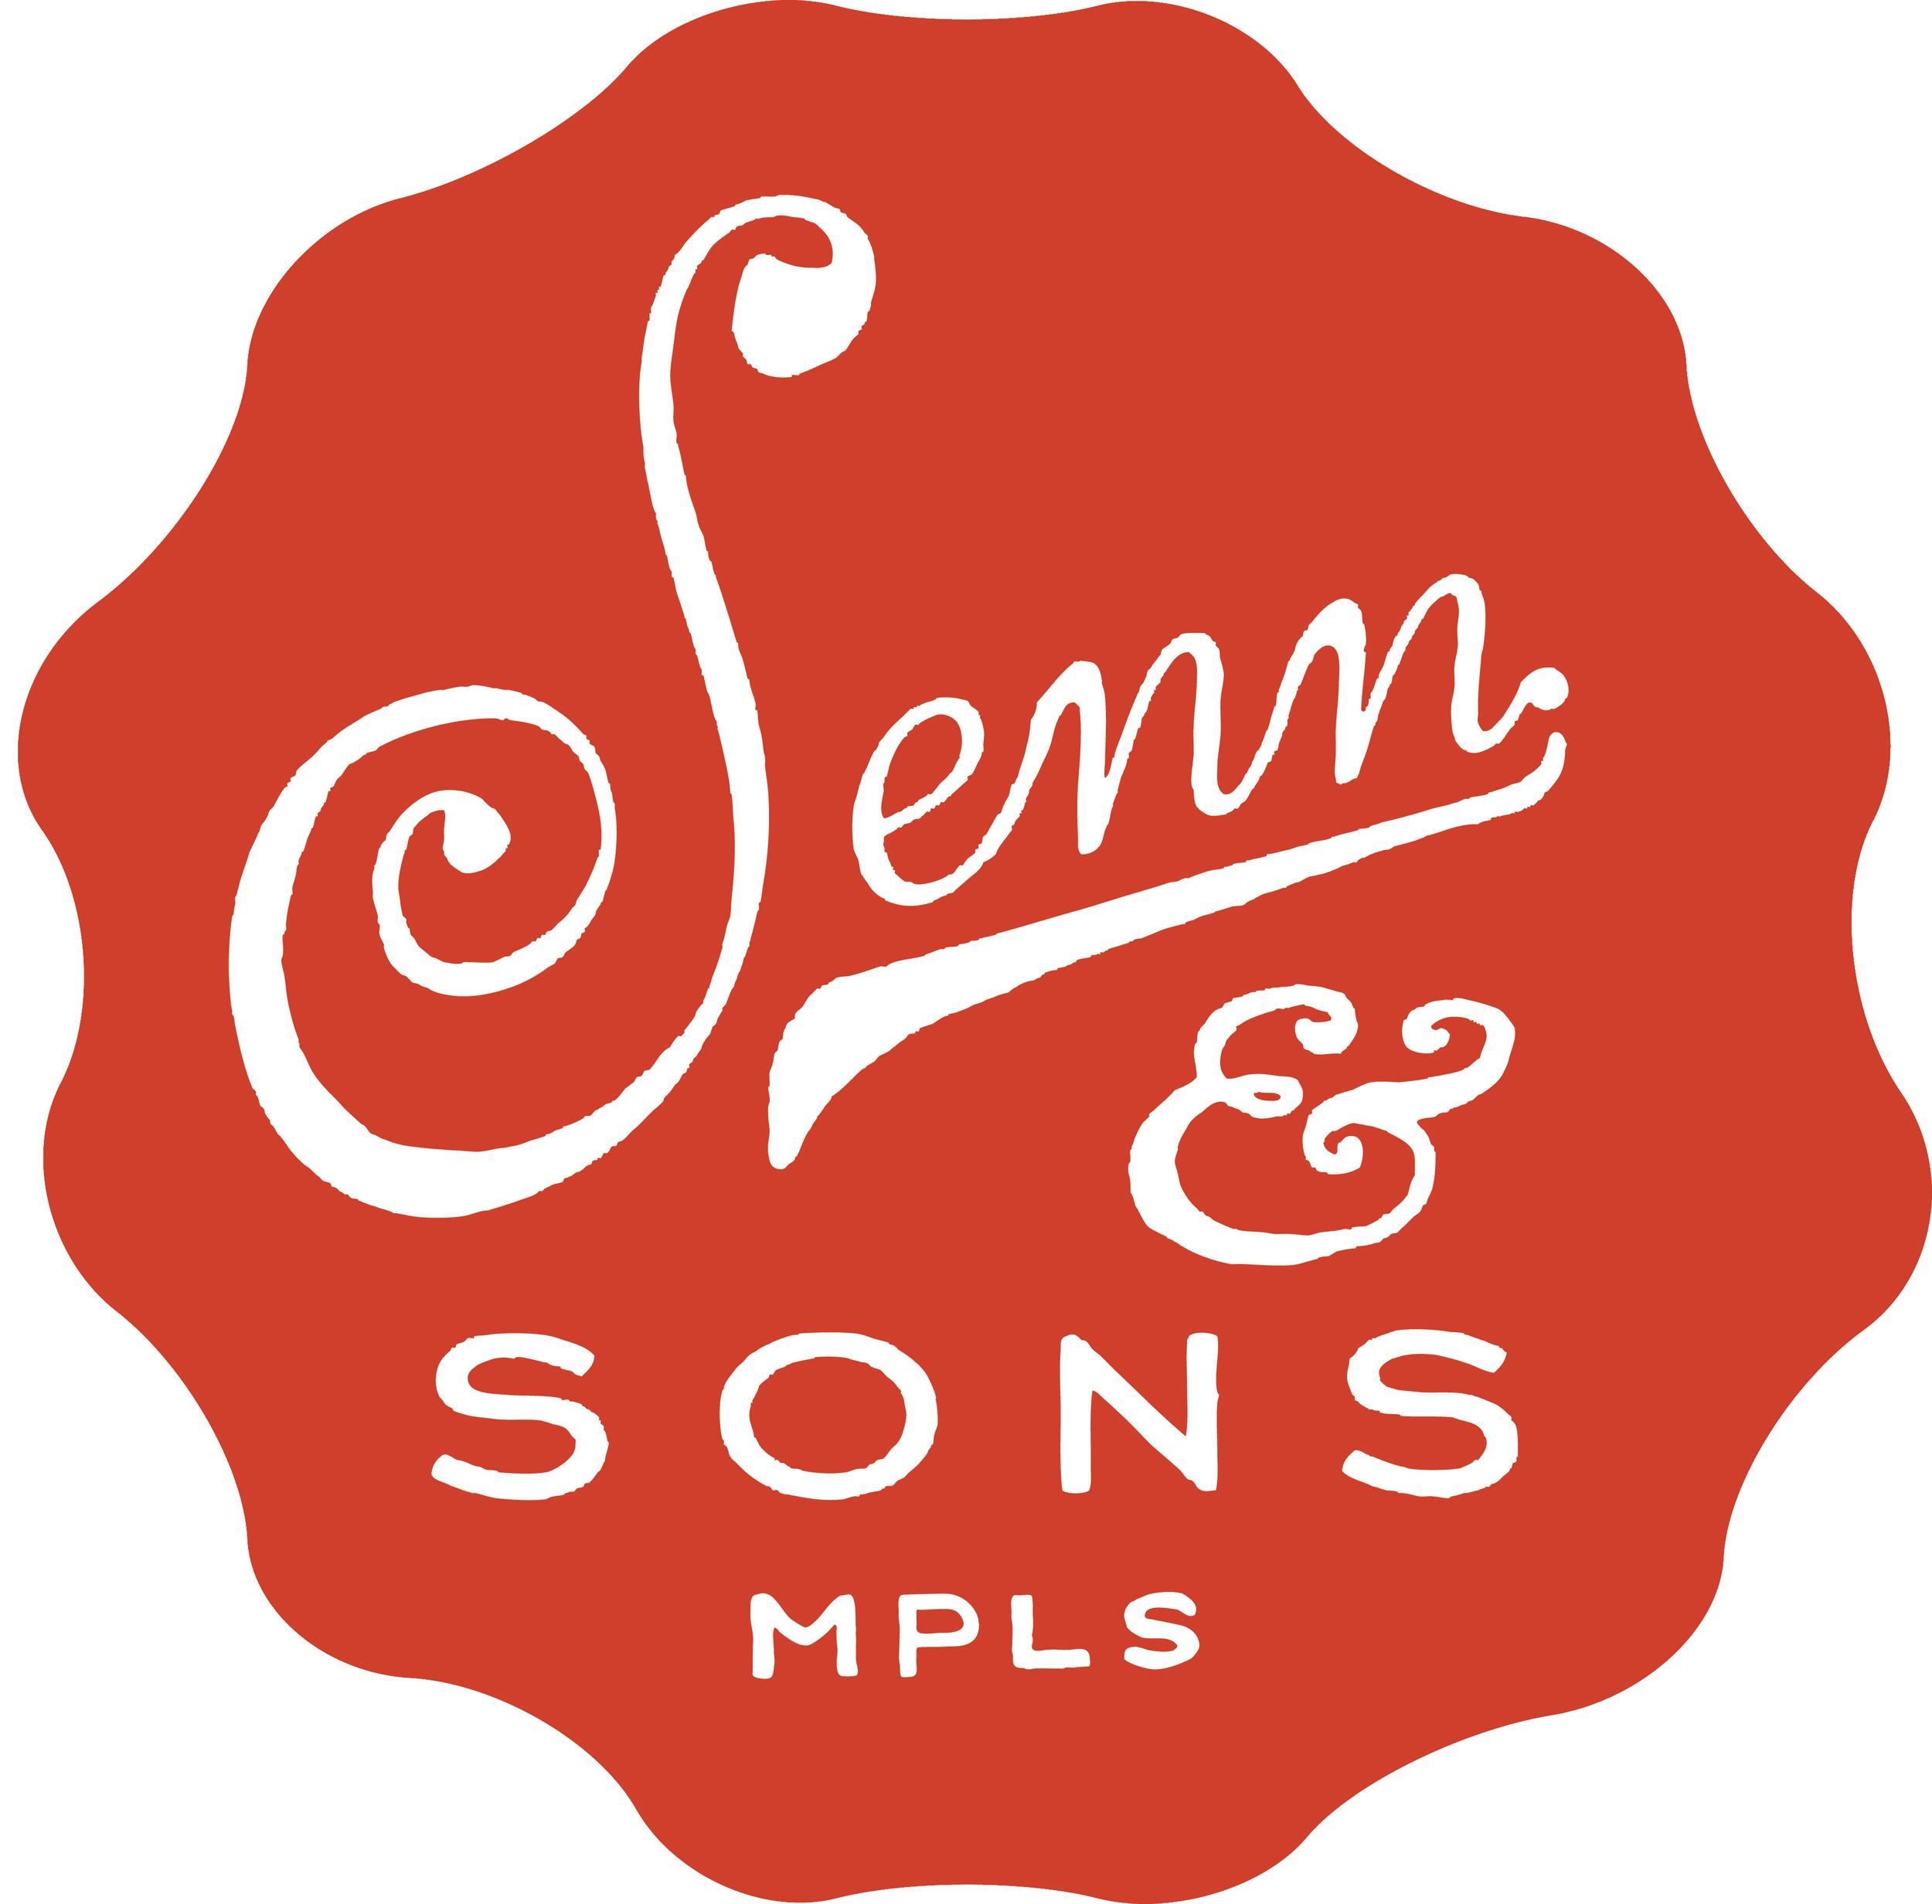 Senn&Sons_MPLS_red 1.jpg